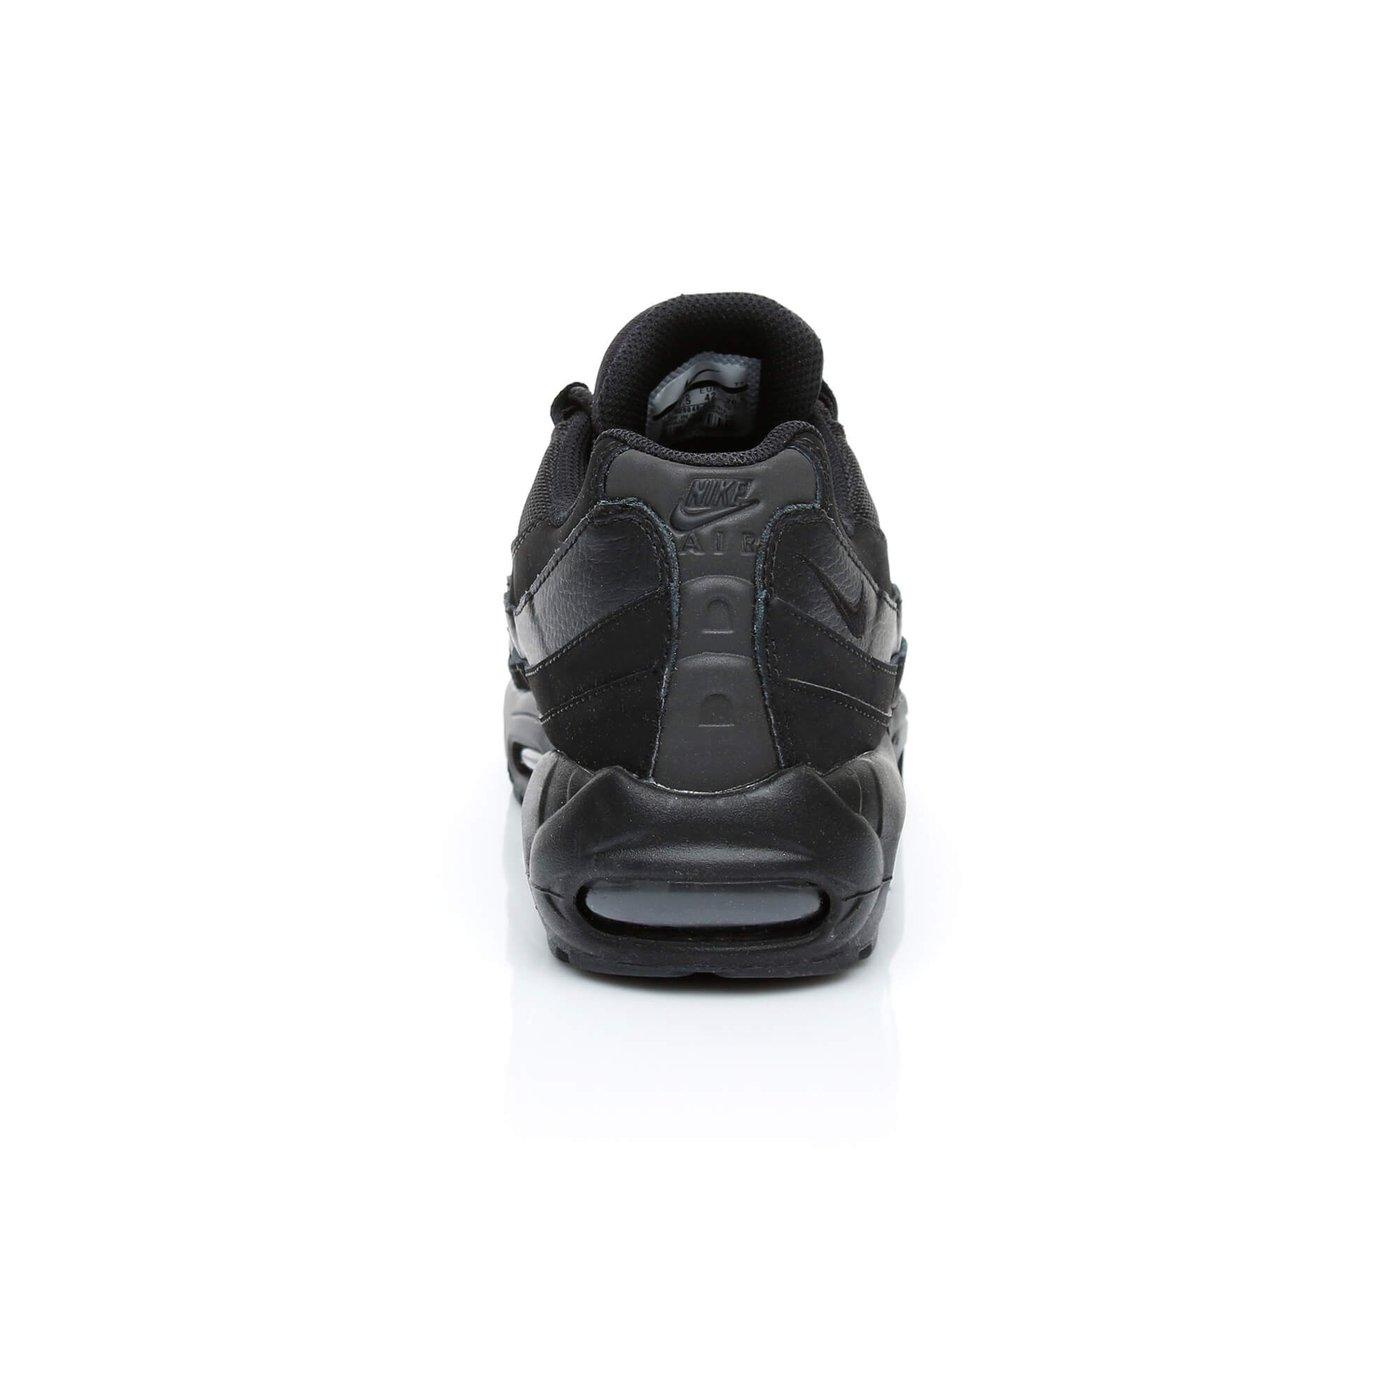 Nike Air Max 95 Erkek Siyah Spor Ayakkabı